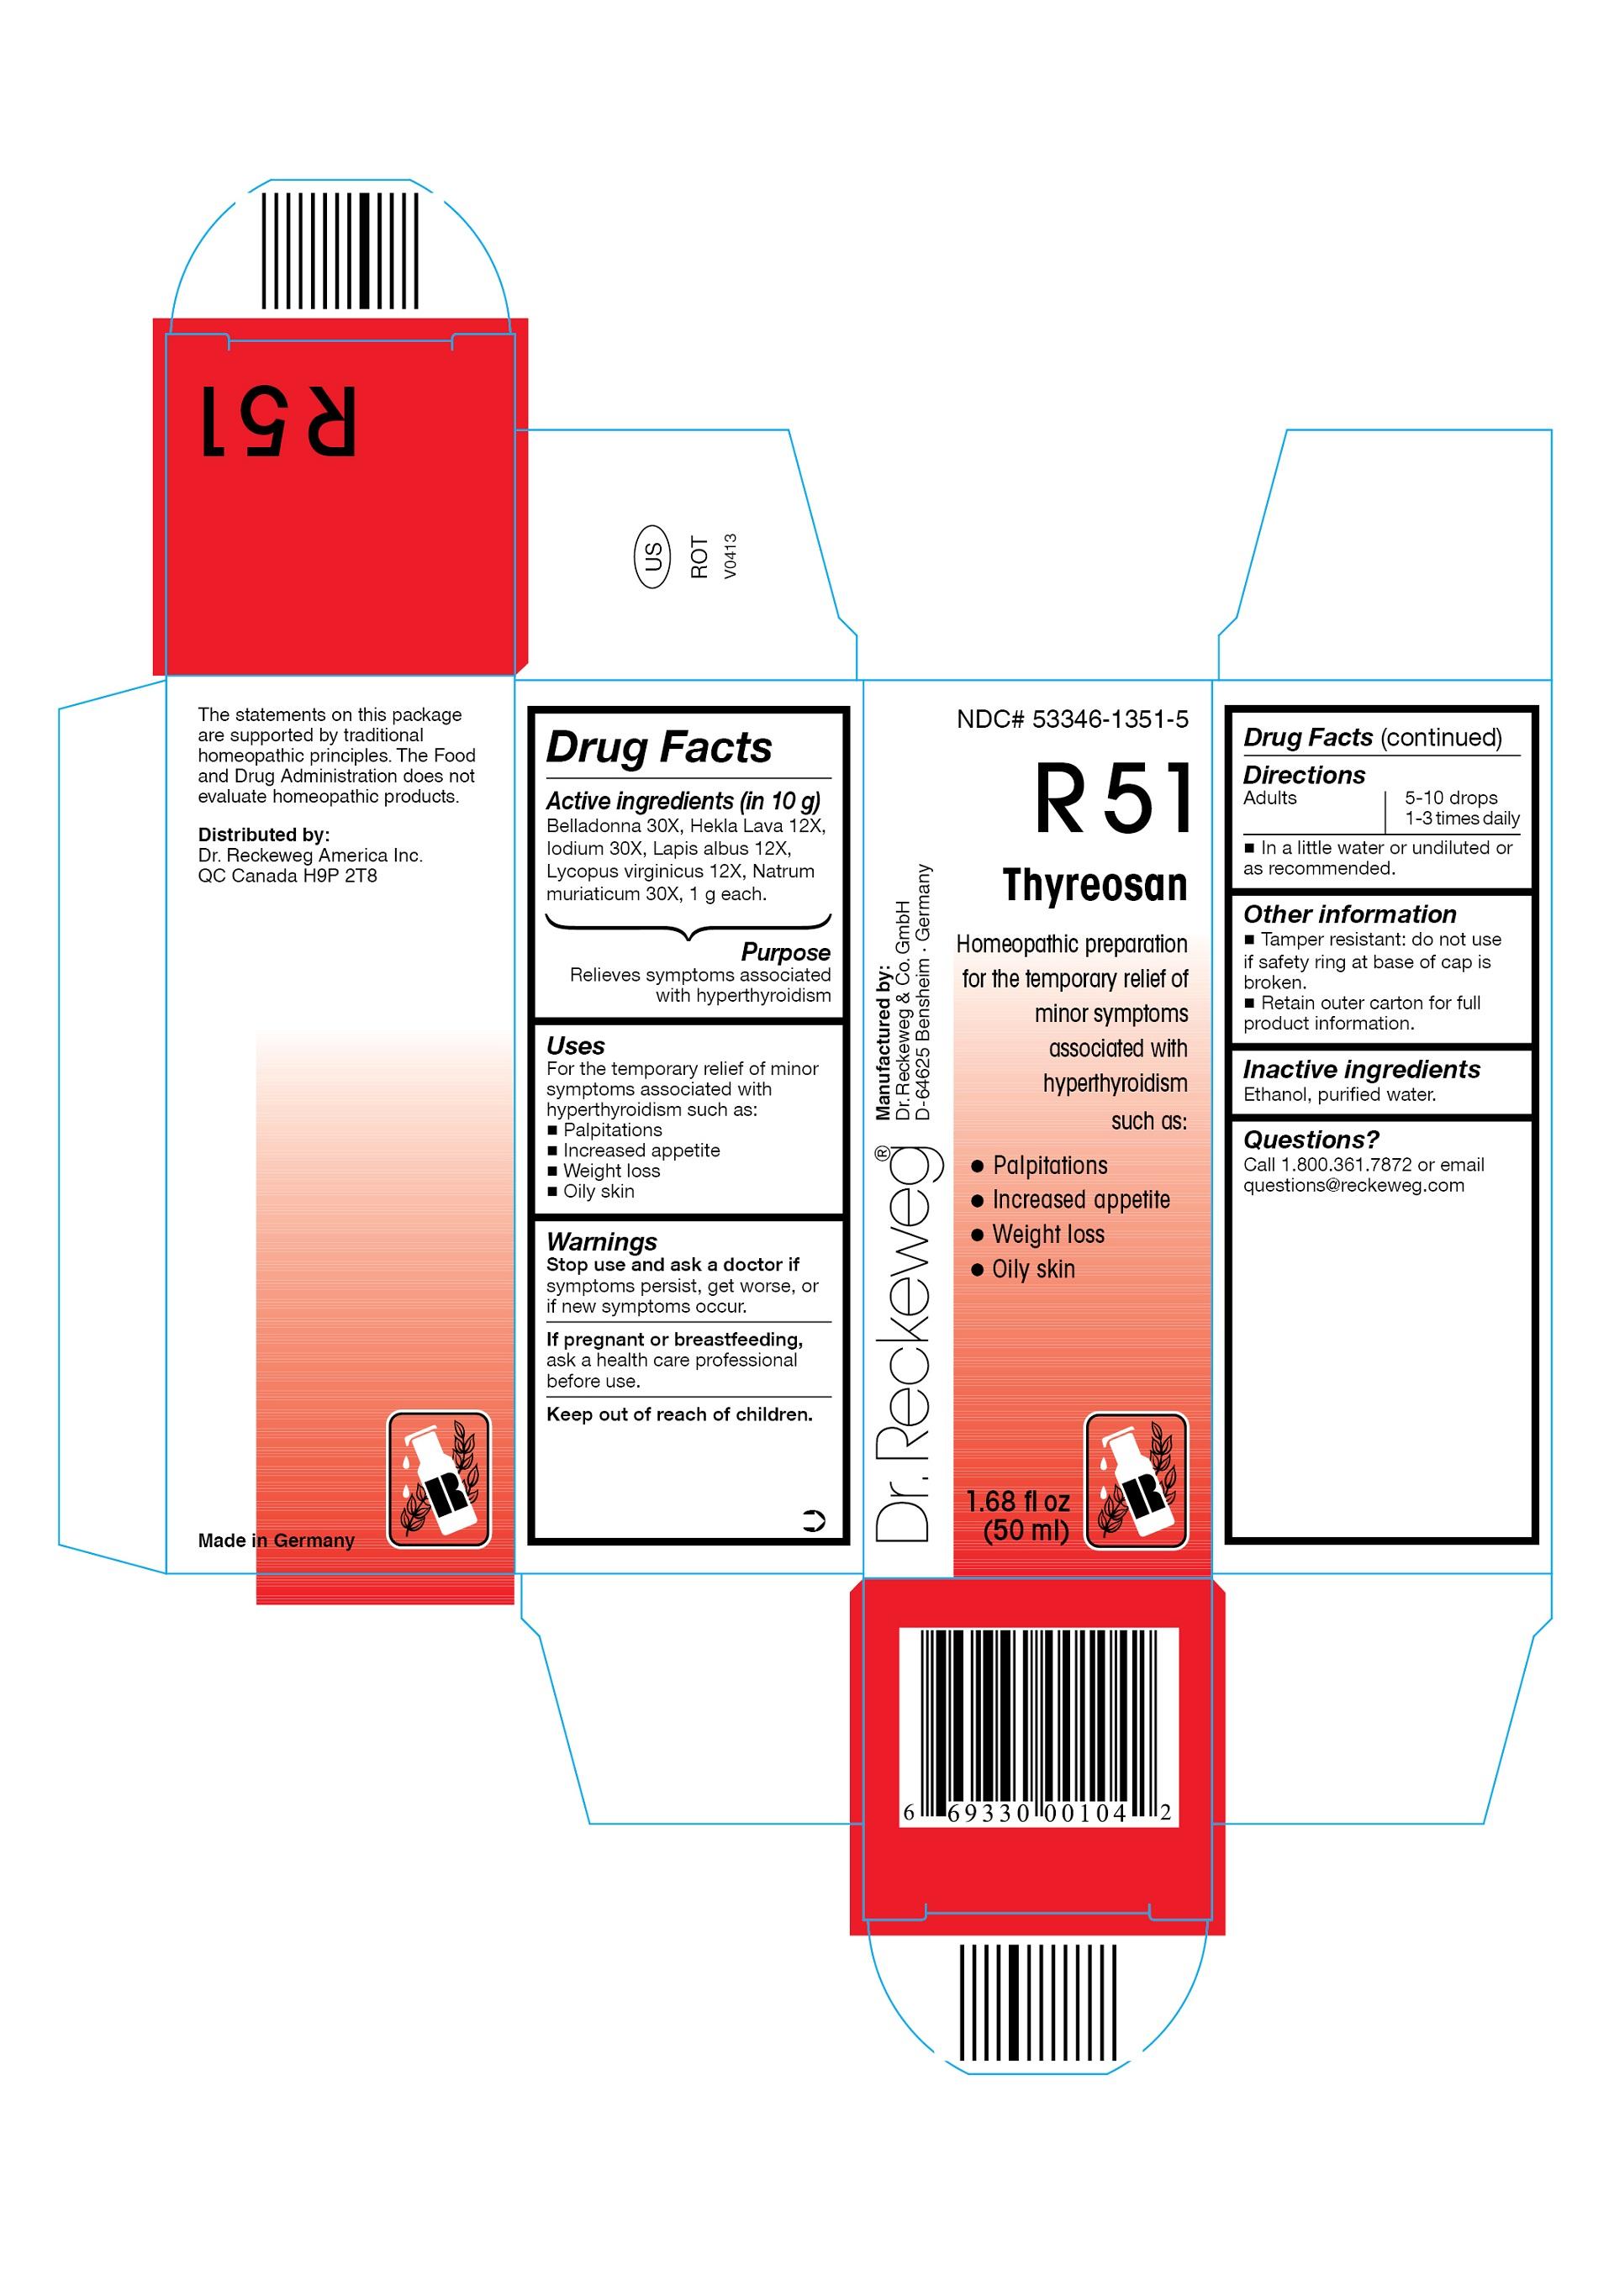 Dr. Reckeweg R51 Thyreosan Combination Product (Belladonna 30x, Hekla Lava 12x, Iodium 30x, Lapis Albus 12x, Lycopus Virginicus 12x, Natrum Muriaticum 30x) Liquid [Pharmazeutische Fabrik Dr. Reckeweg & Co]